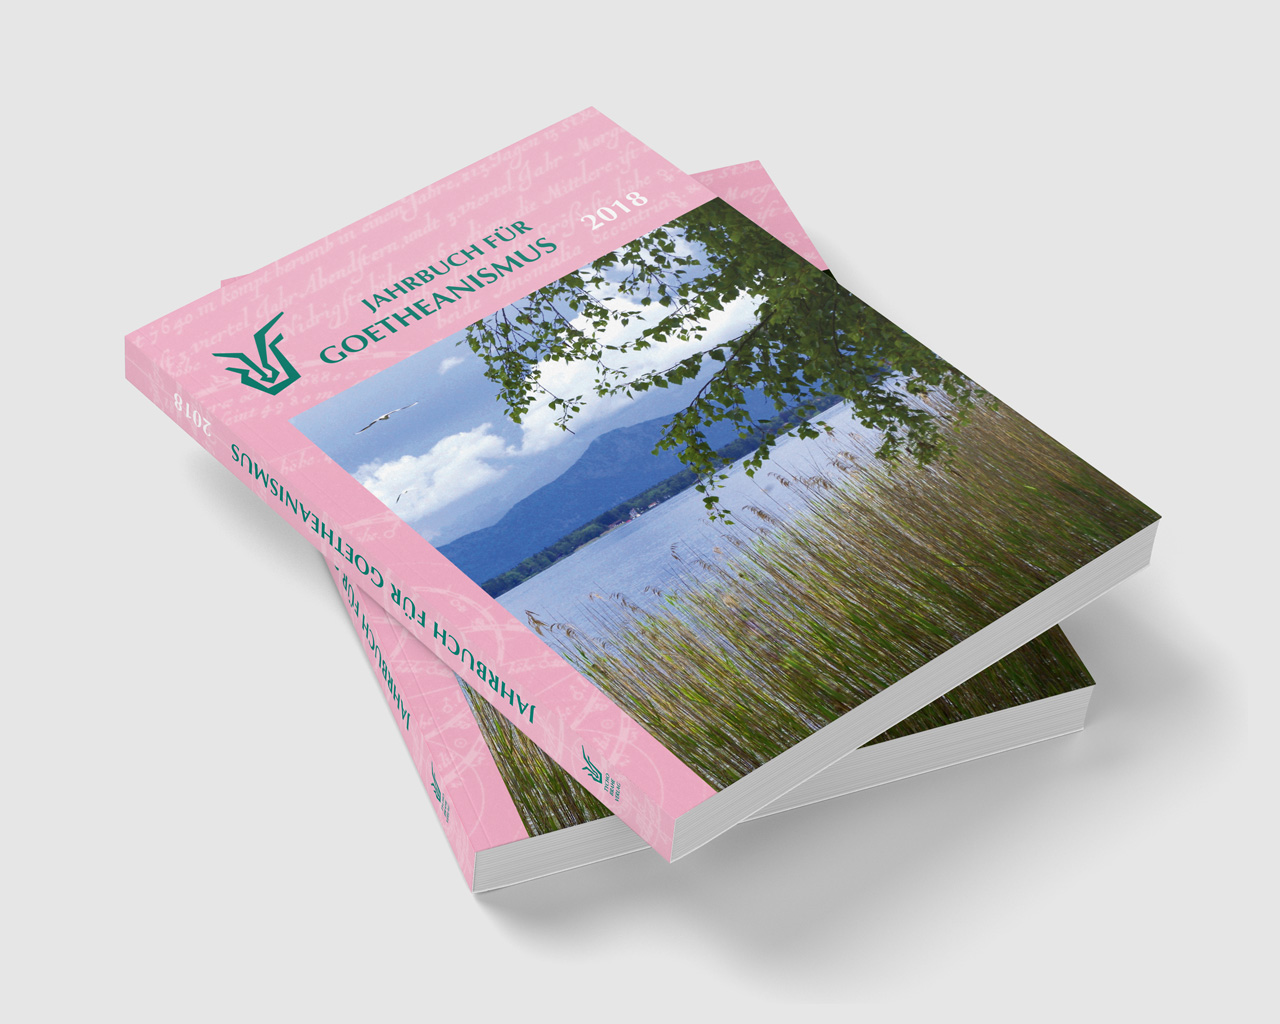 Jahrbuch Goetheanismus